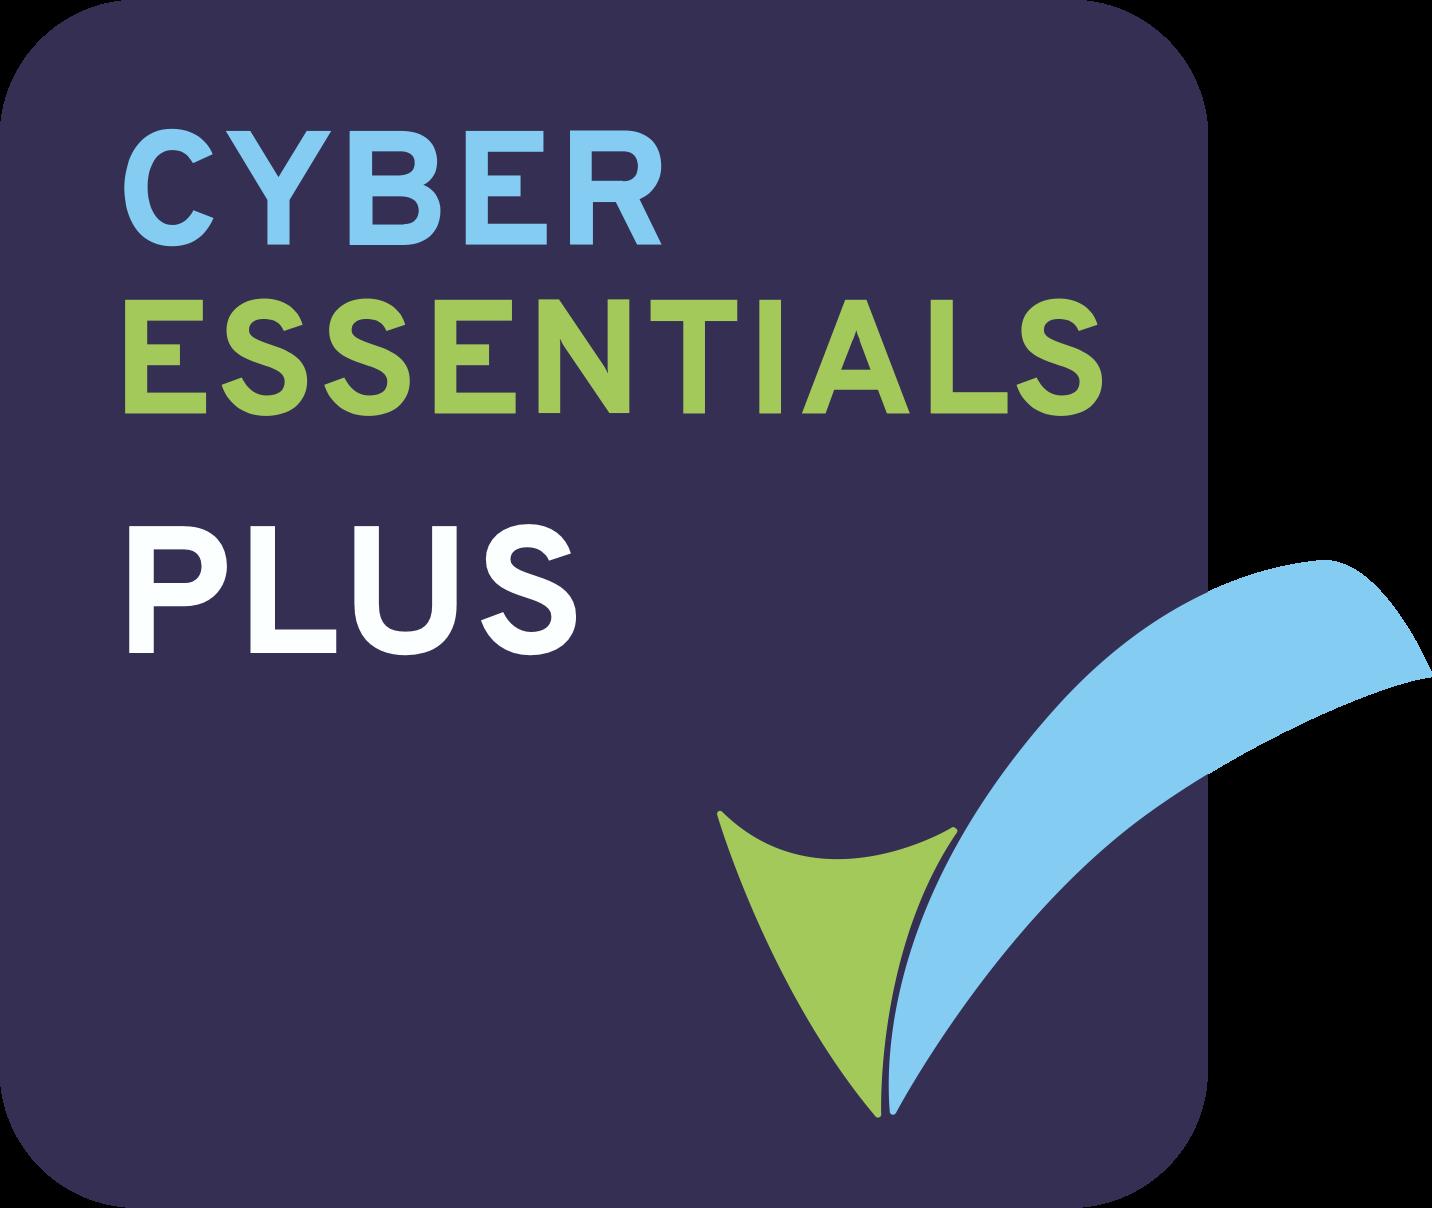 Cyber clipart tailor (72dpi) (PLUS) Badge Large Essentials